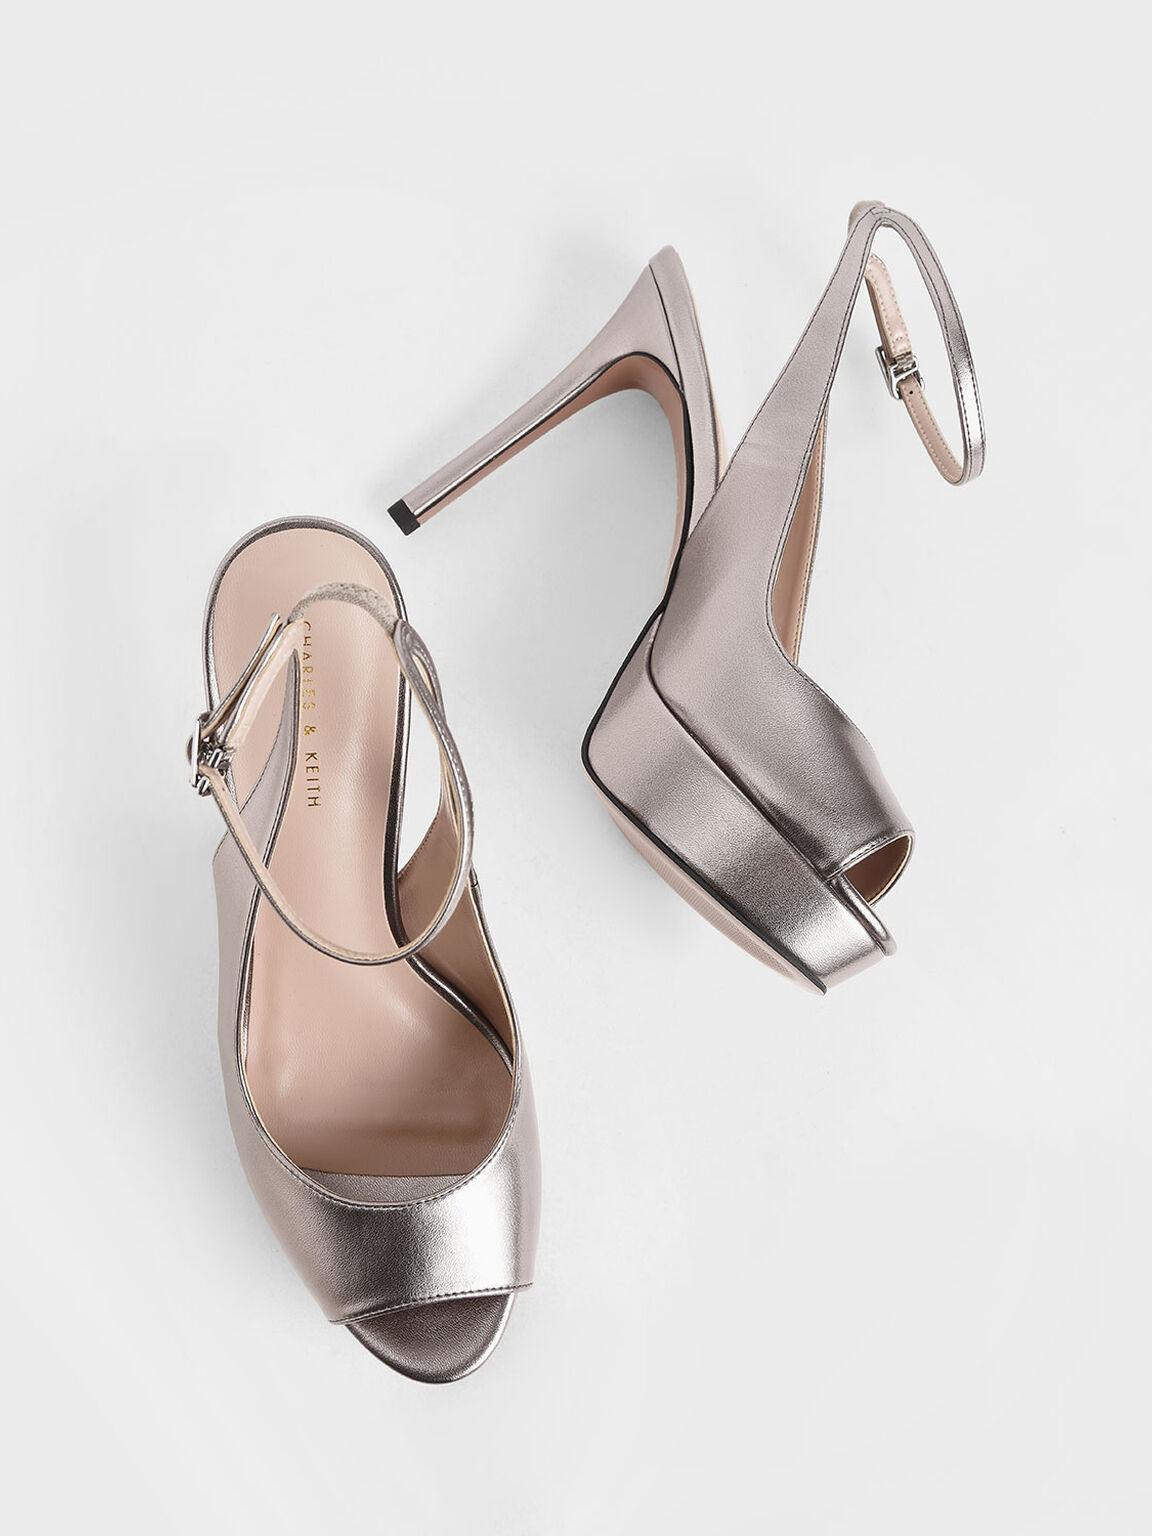 Metallic Ankle Strap Platform Heels, Pewter, hi-res